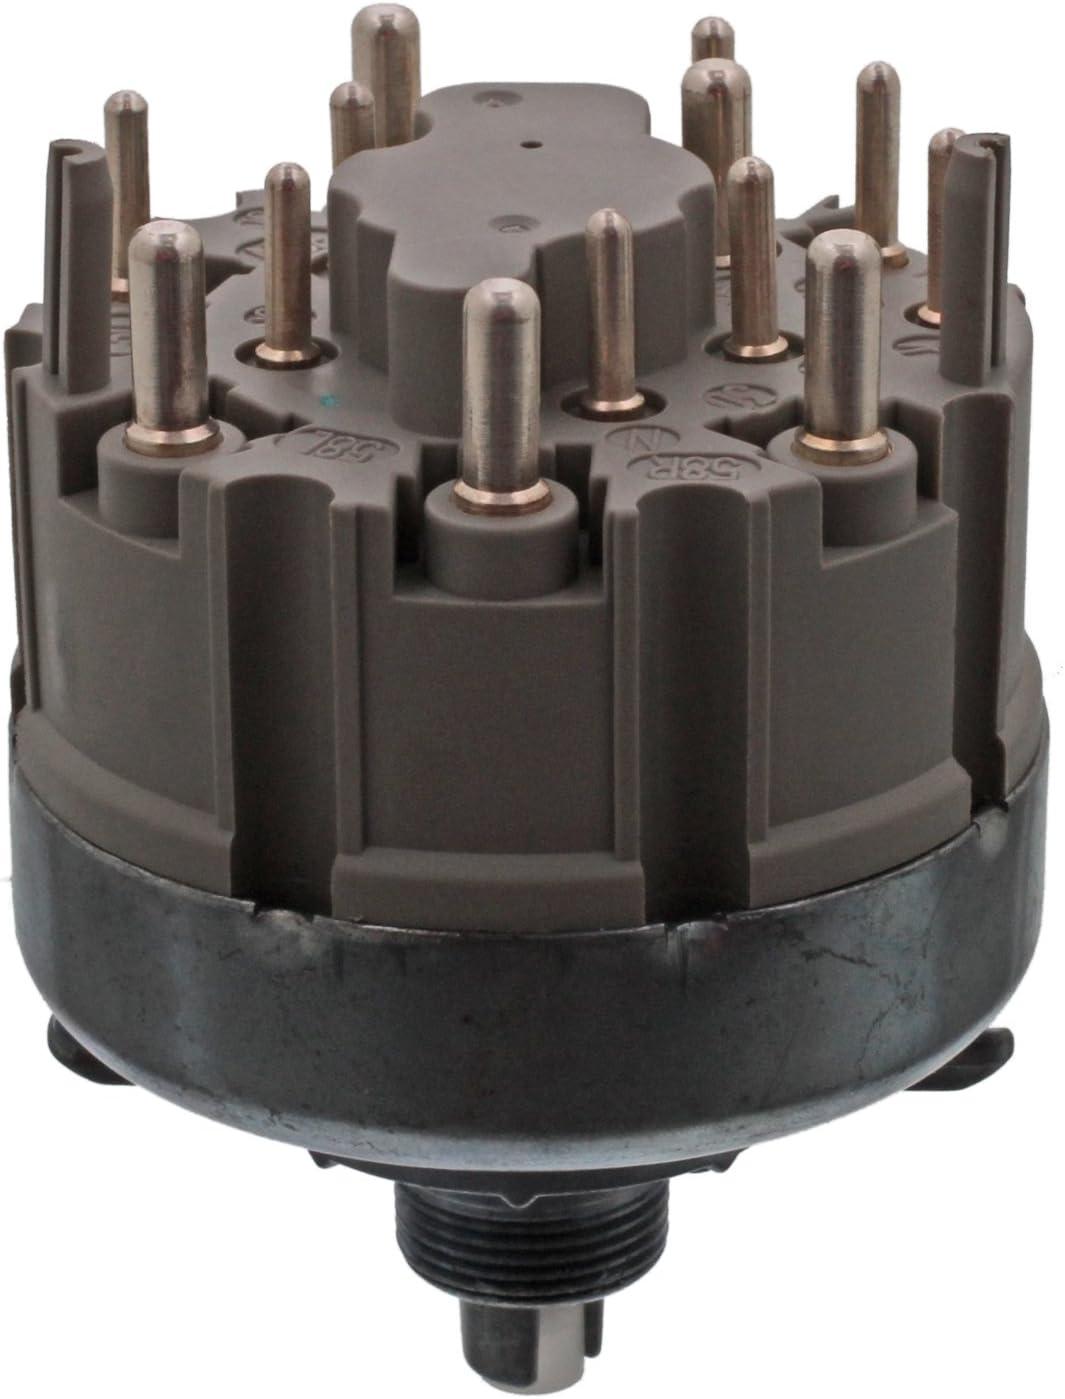 Headlight Switch Plastic FEBI For MERCEDES A124 C124 C126 R129 S124 0005456204